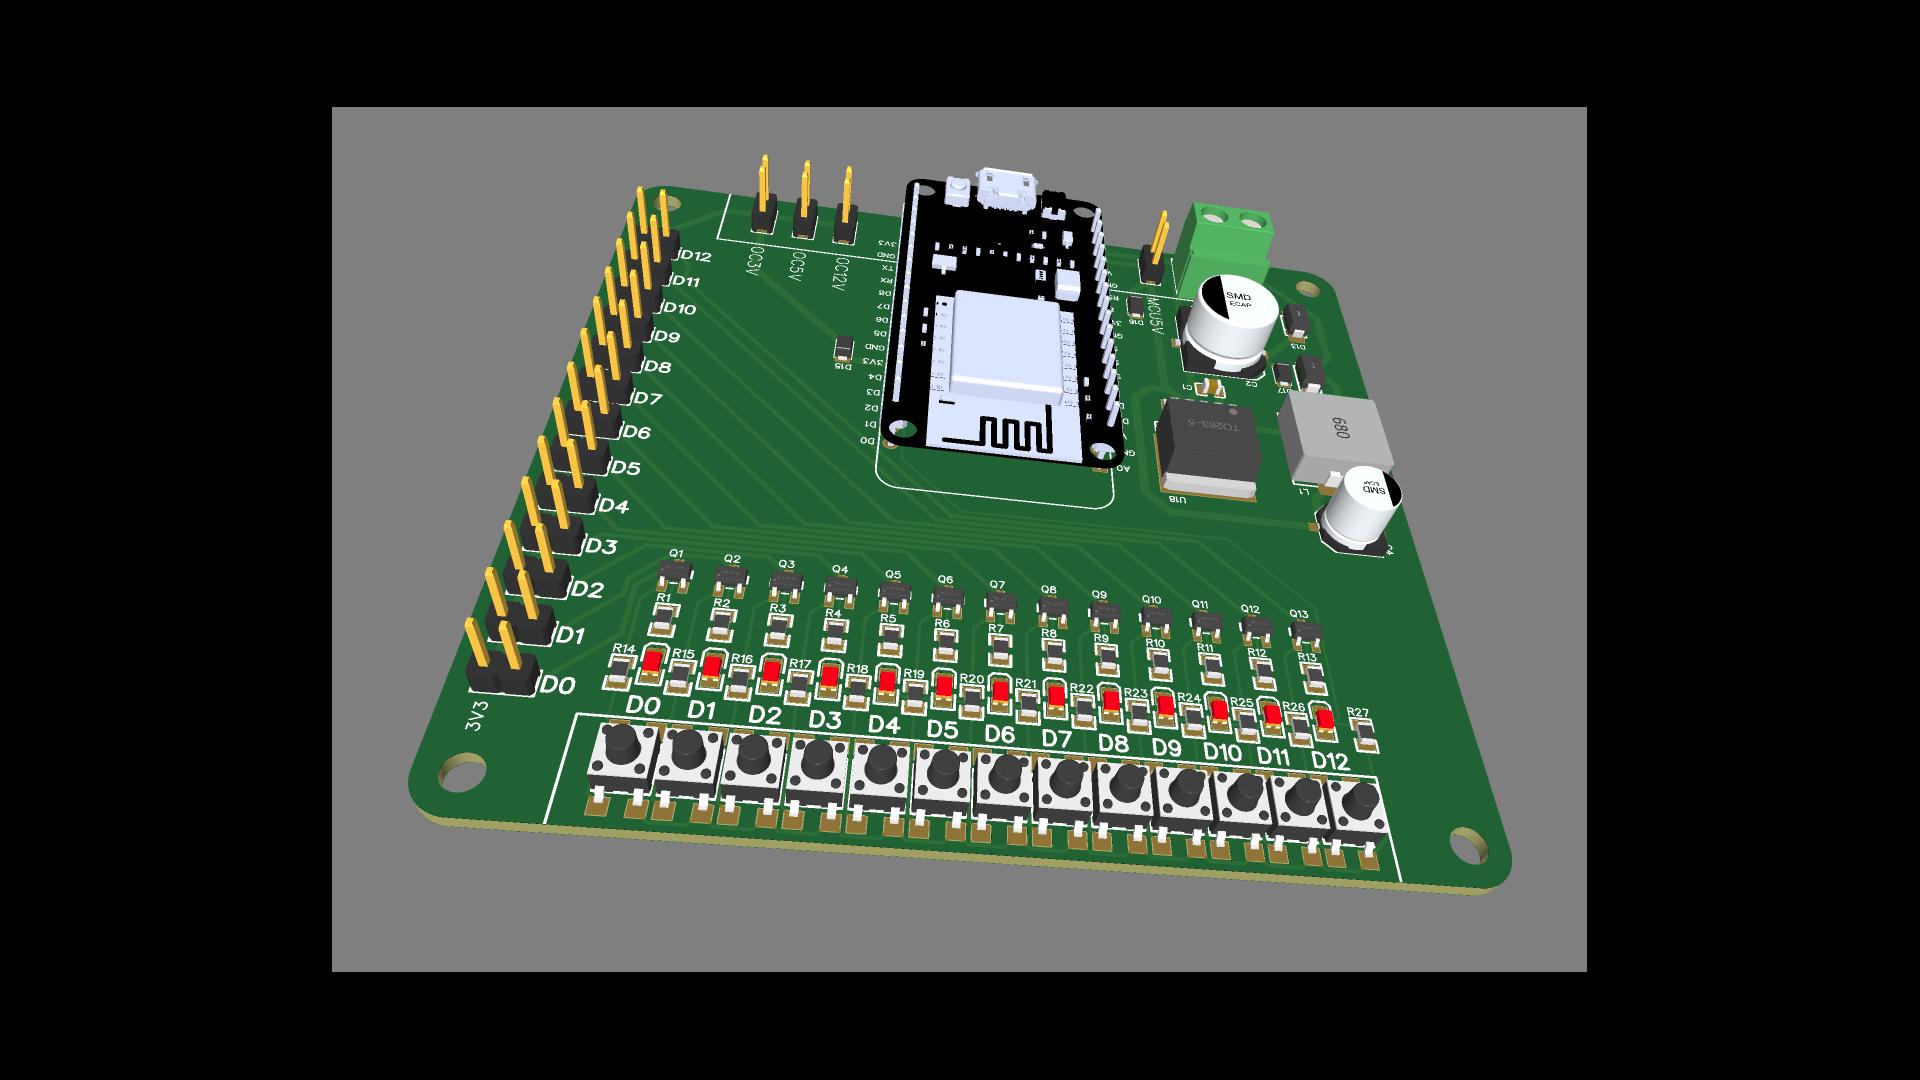 NodeMCU test board